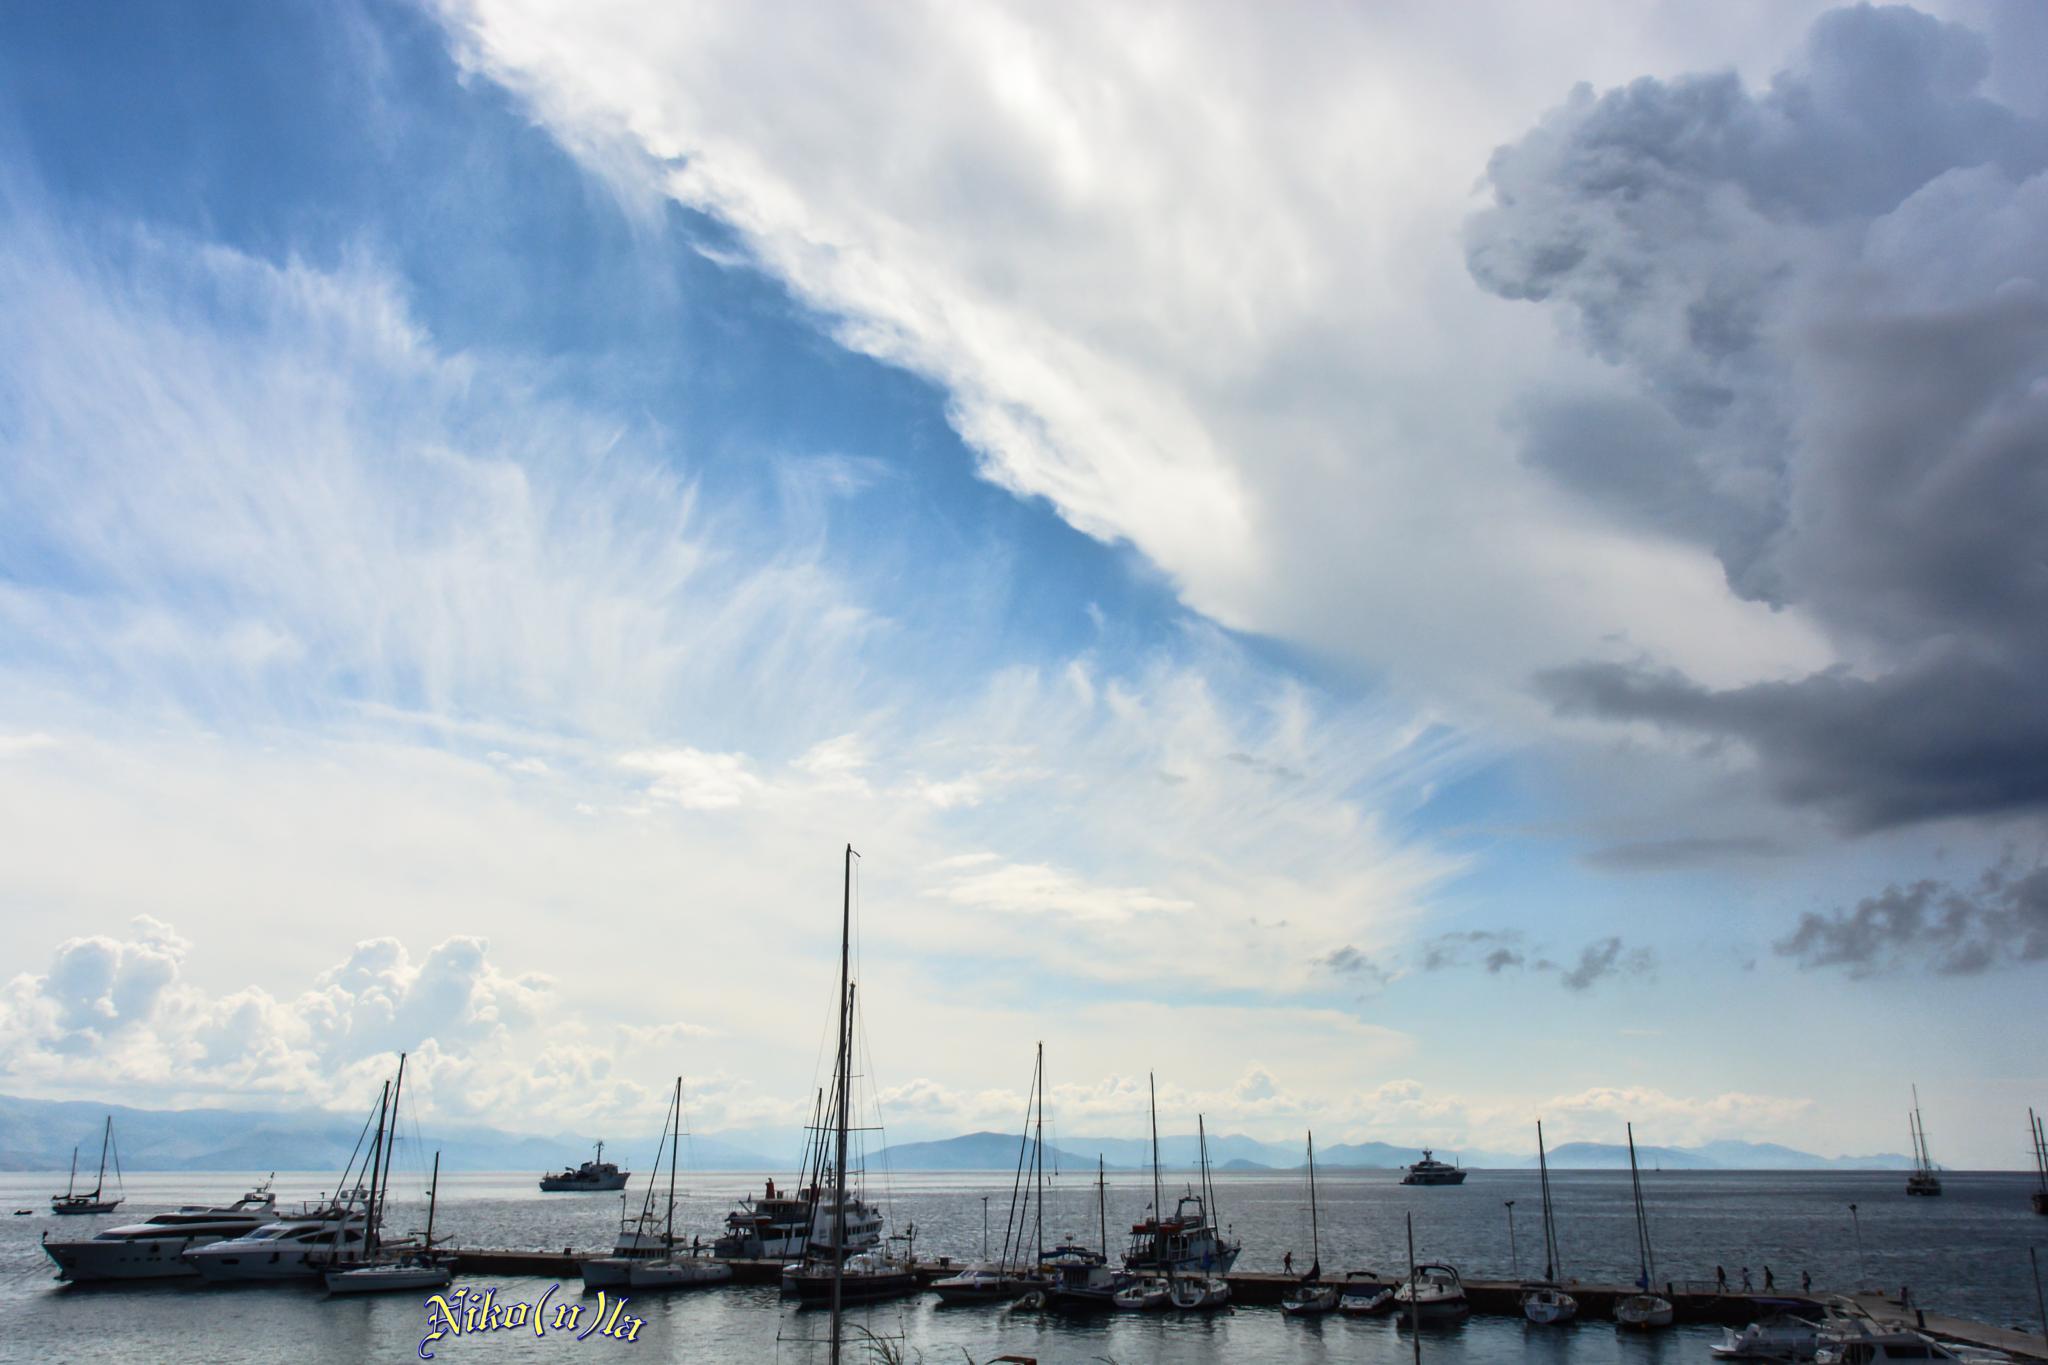 Port Corfu, Greece by Nikola Bjelobaba